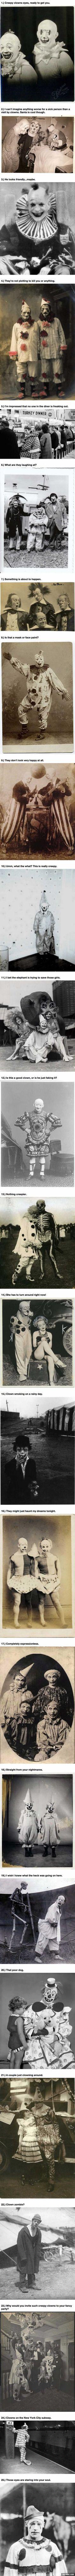 These 25 Vintage Clown Photos Are Mega Creepy